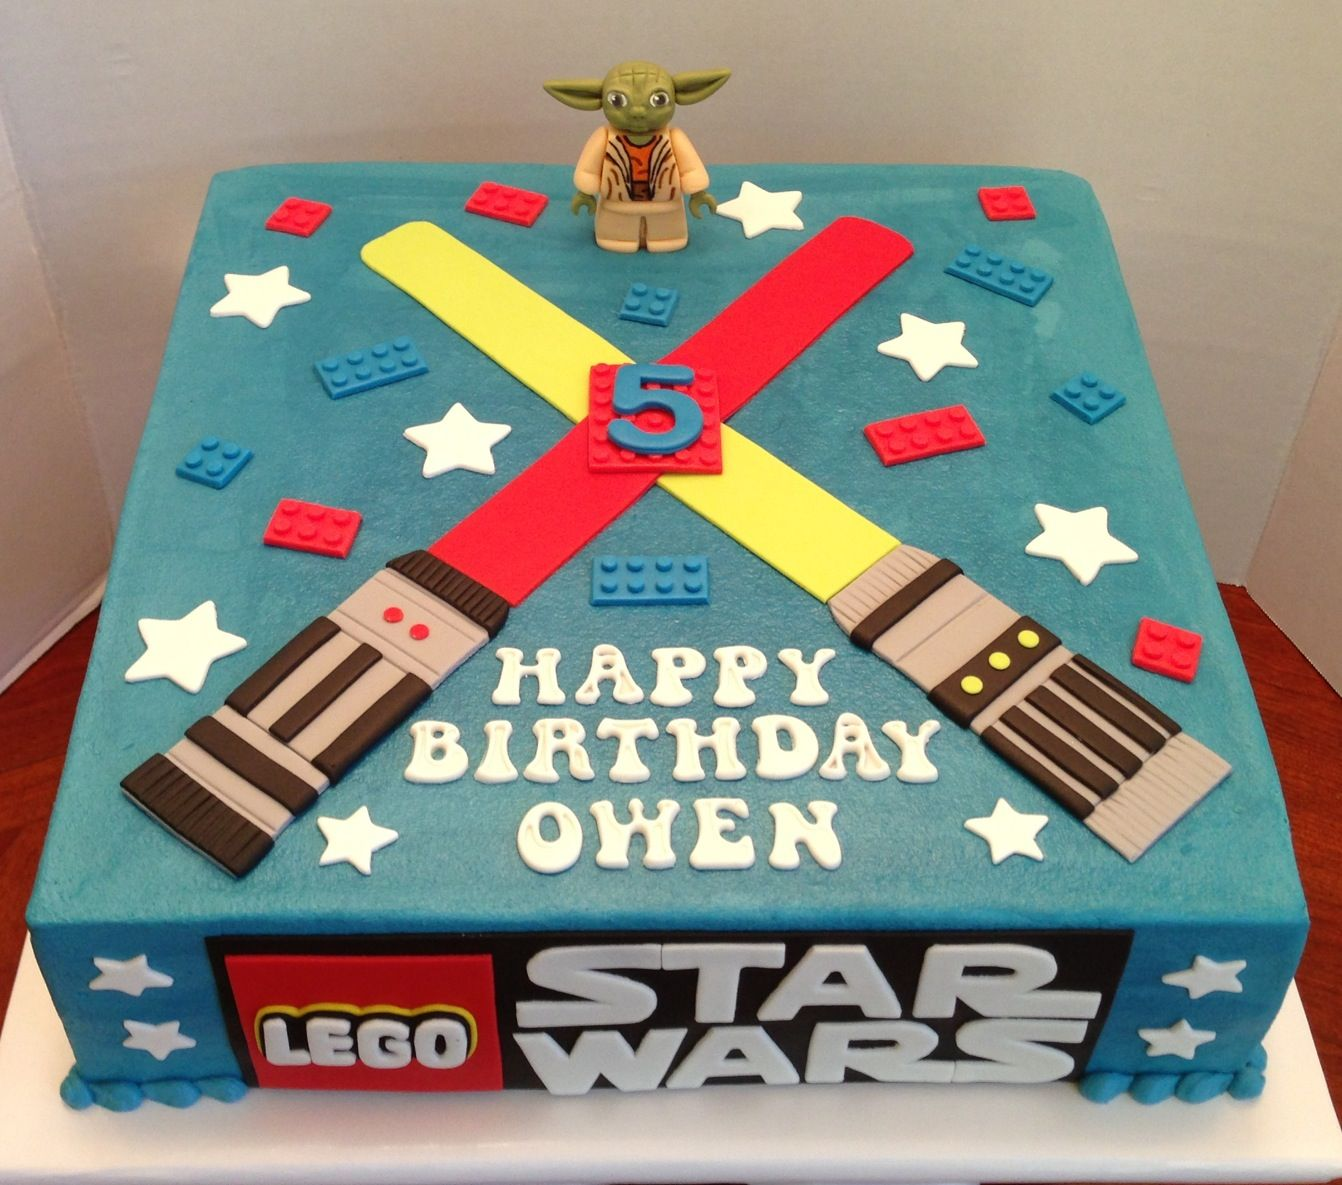 Lego Star Wars cake with Yoda mini figure. Original design by ?